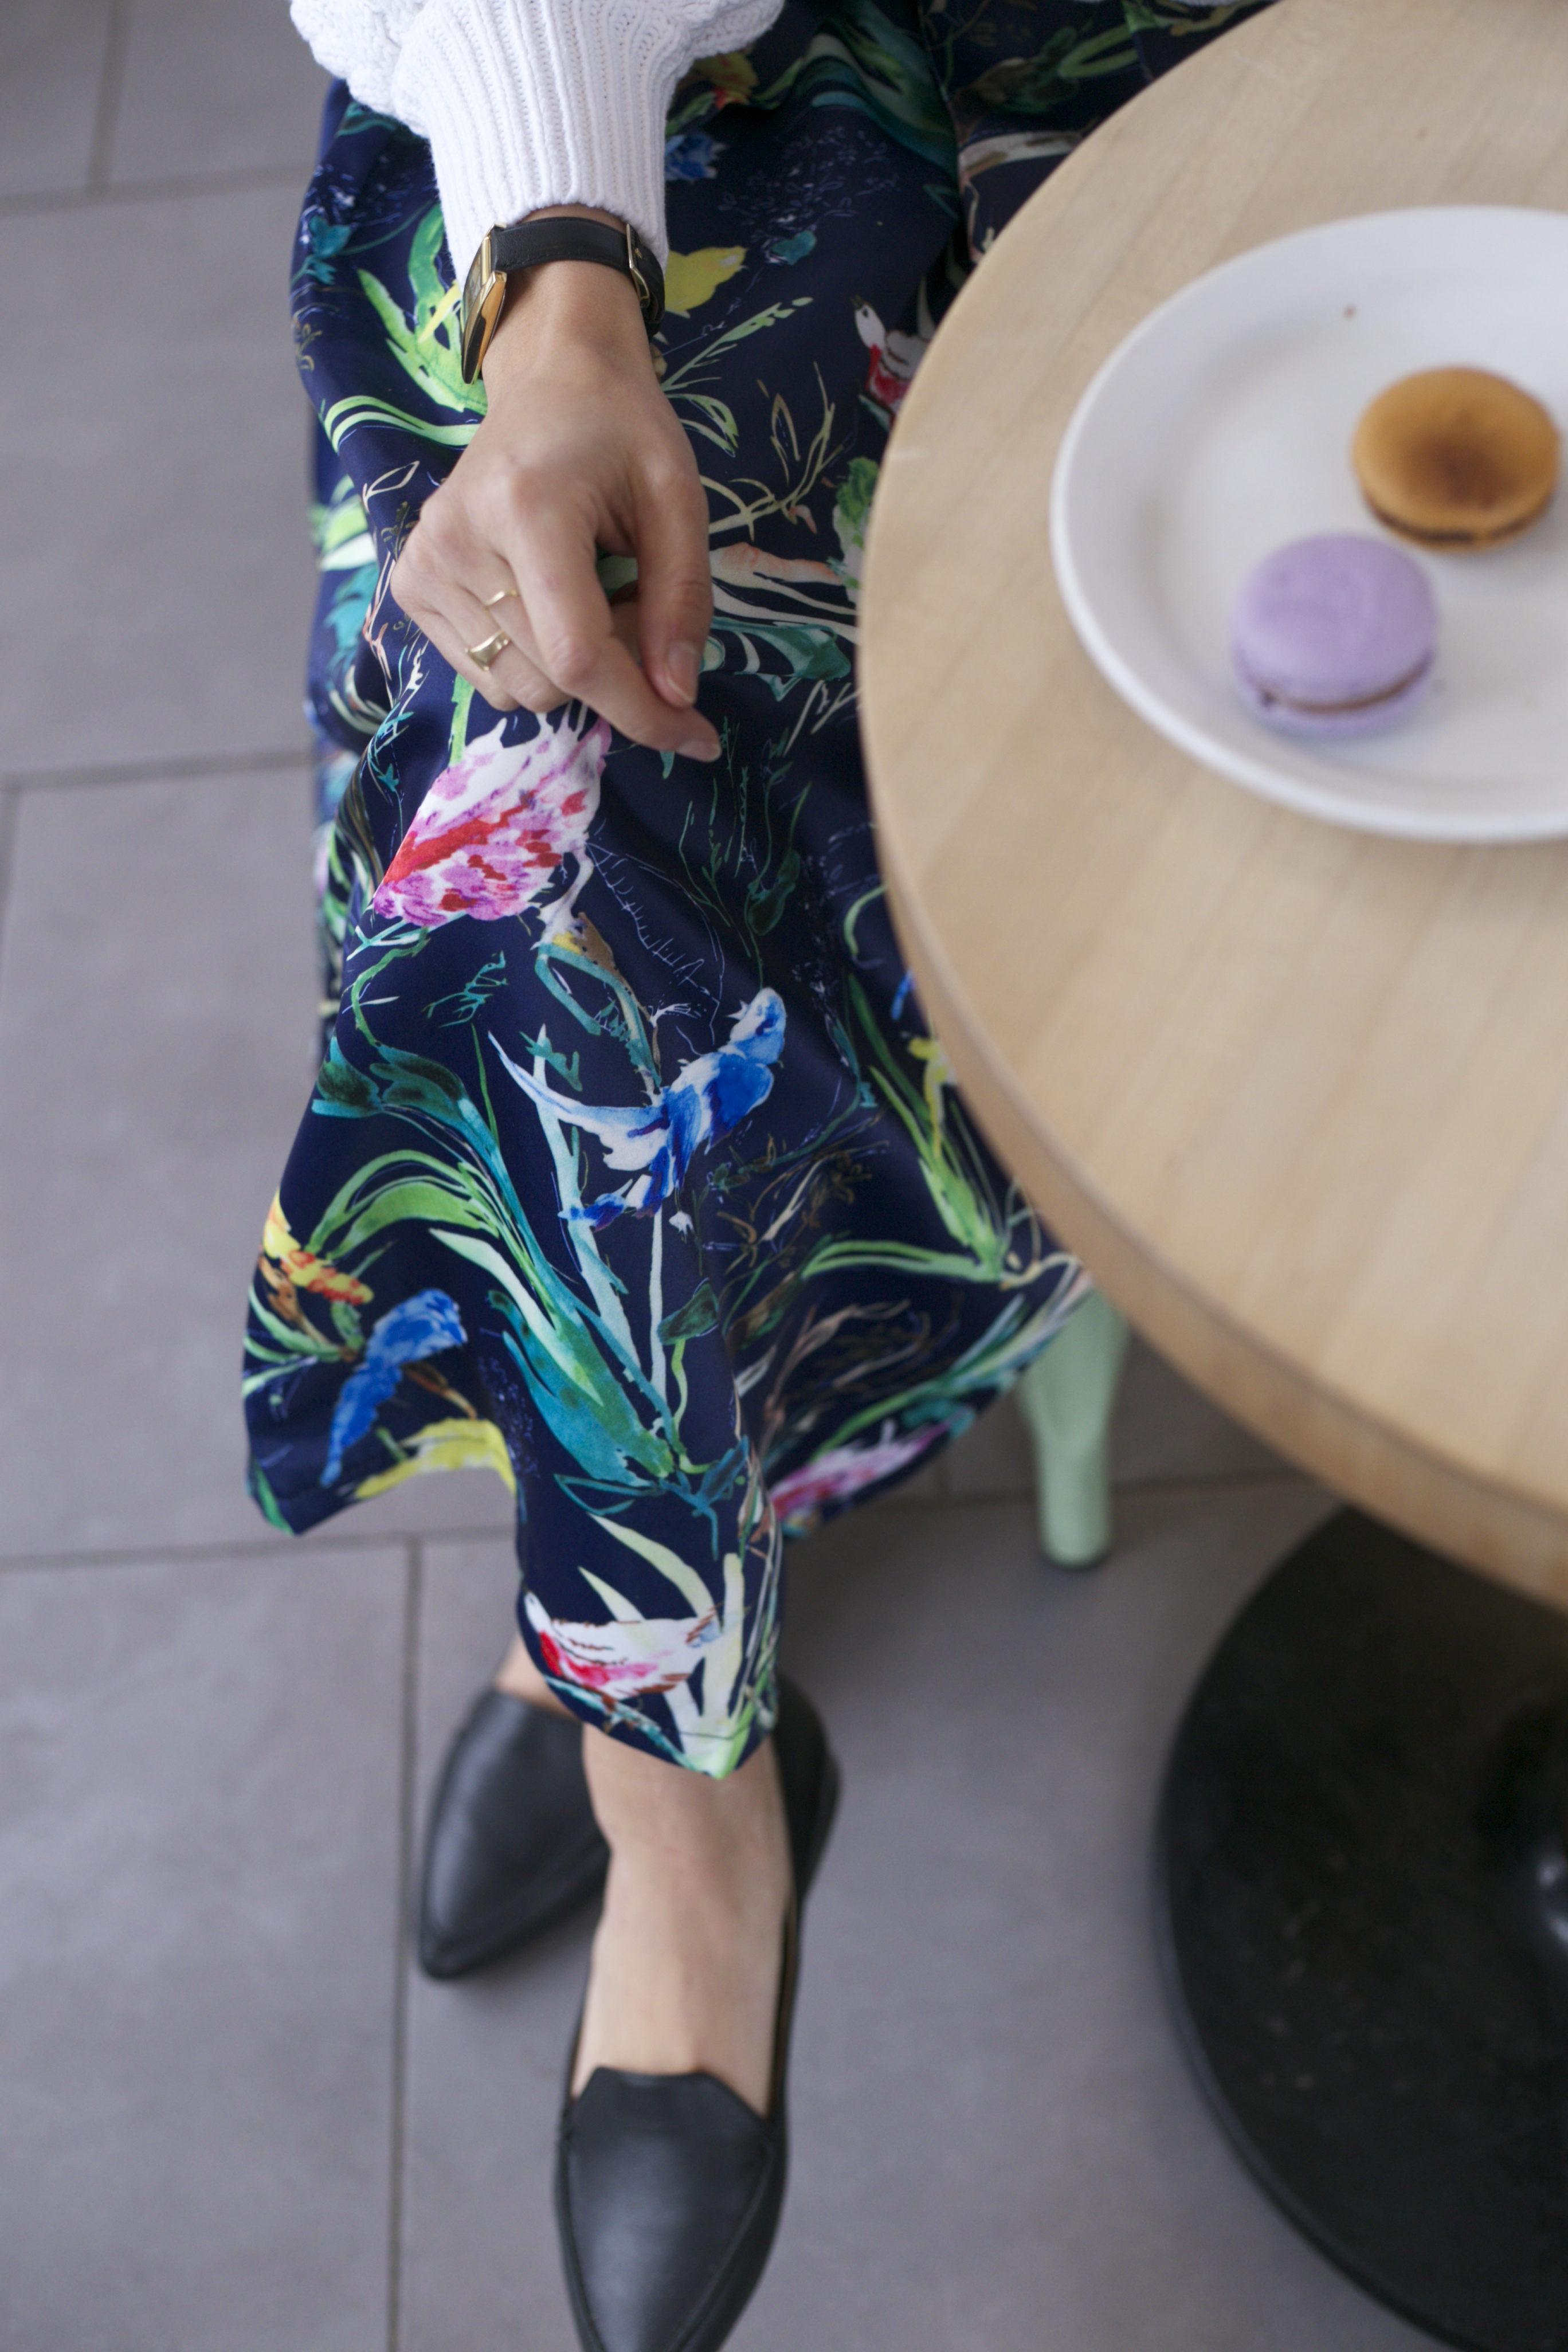 Poppy Barley, ethical footwear, sustainable footwear, ethically made footwear, canadian footwear, Canadian designer, ecochic, conscious consumer, conscious fashion, ethical fashion, sustainable fashion, Poppy Barley pop up Ottawa,